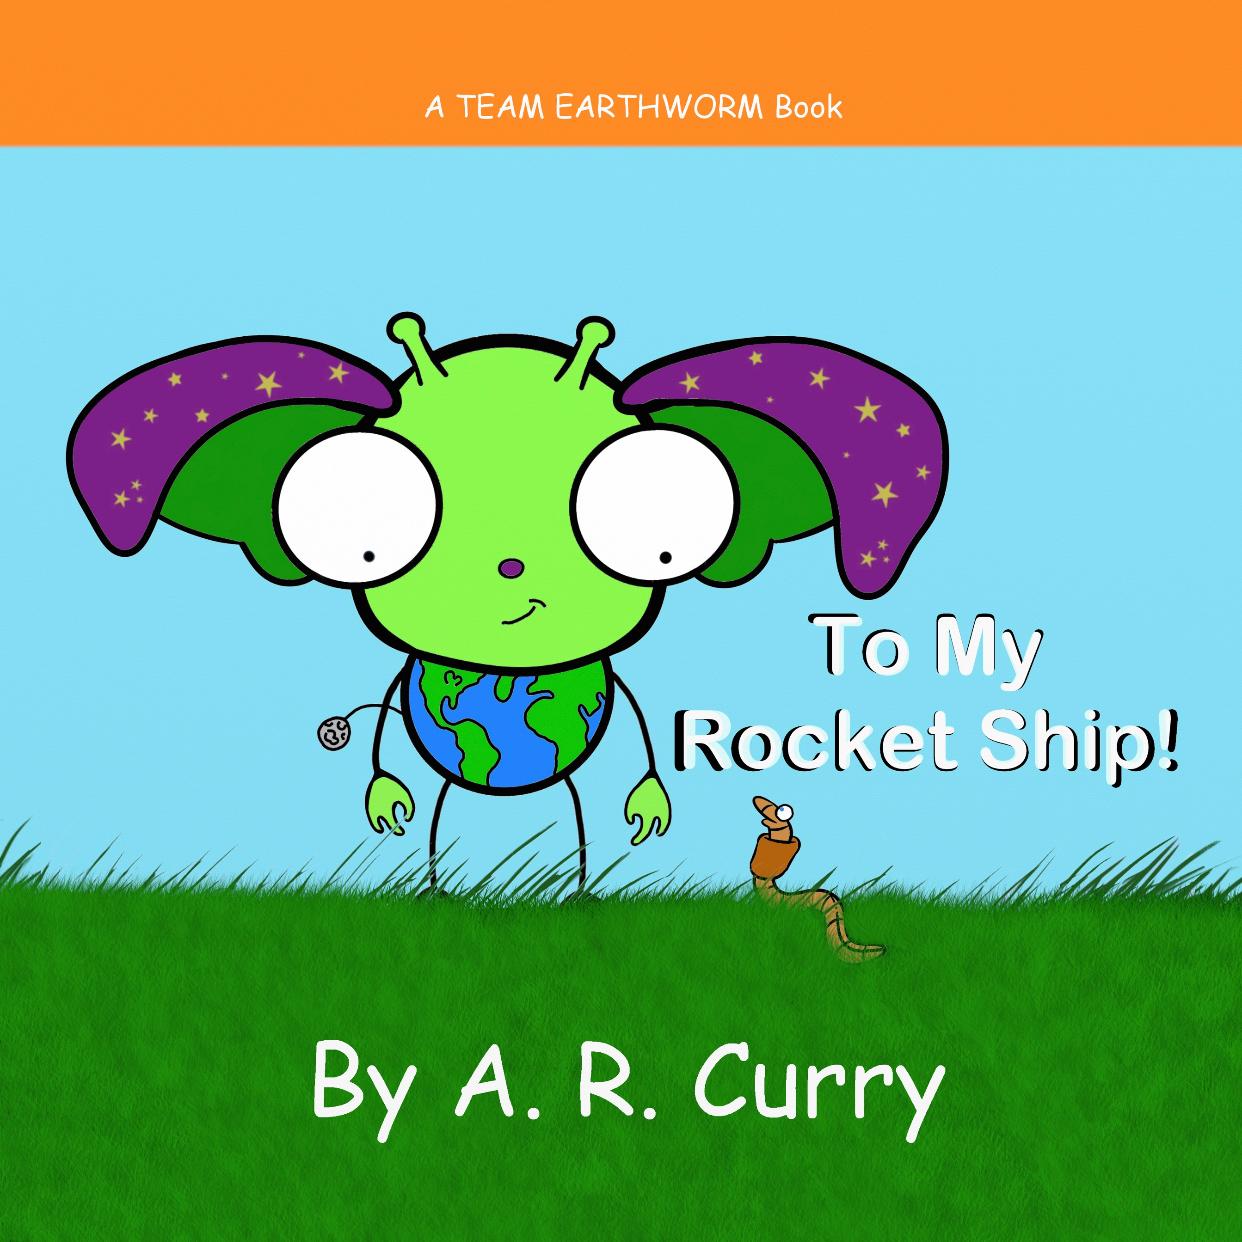 To My Rocket Ship!